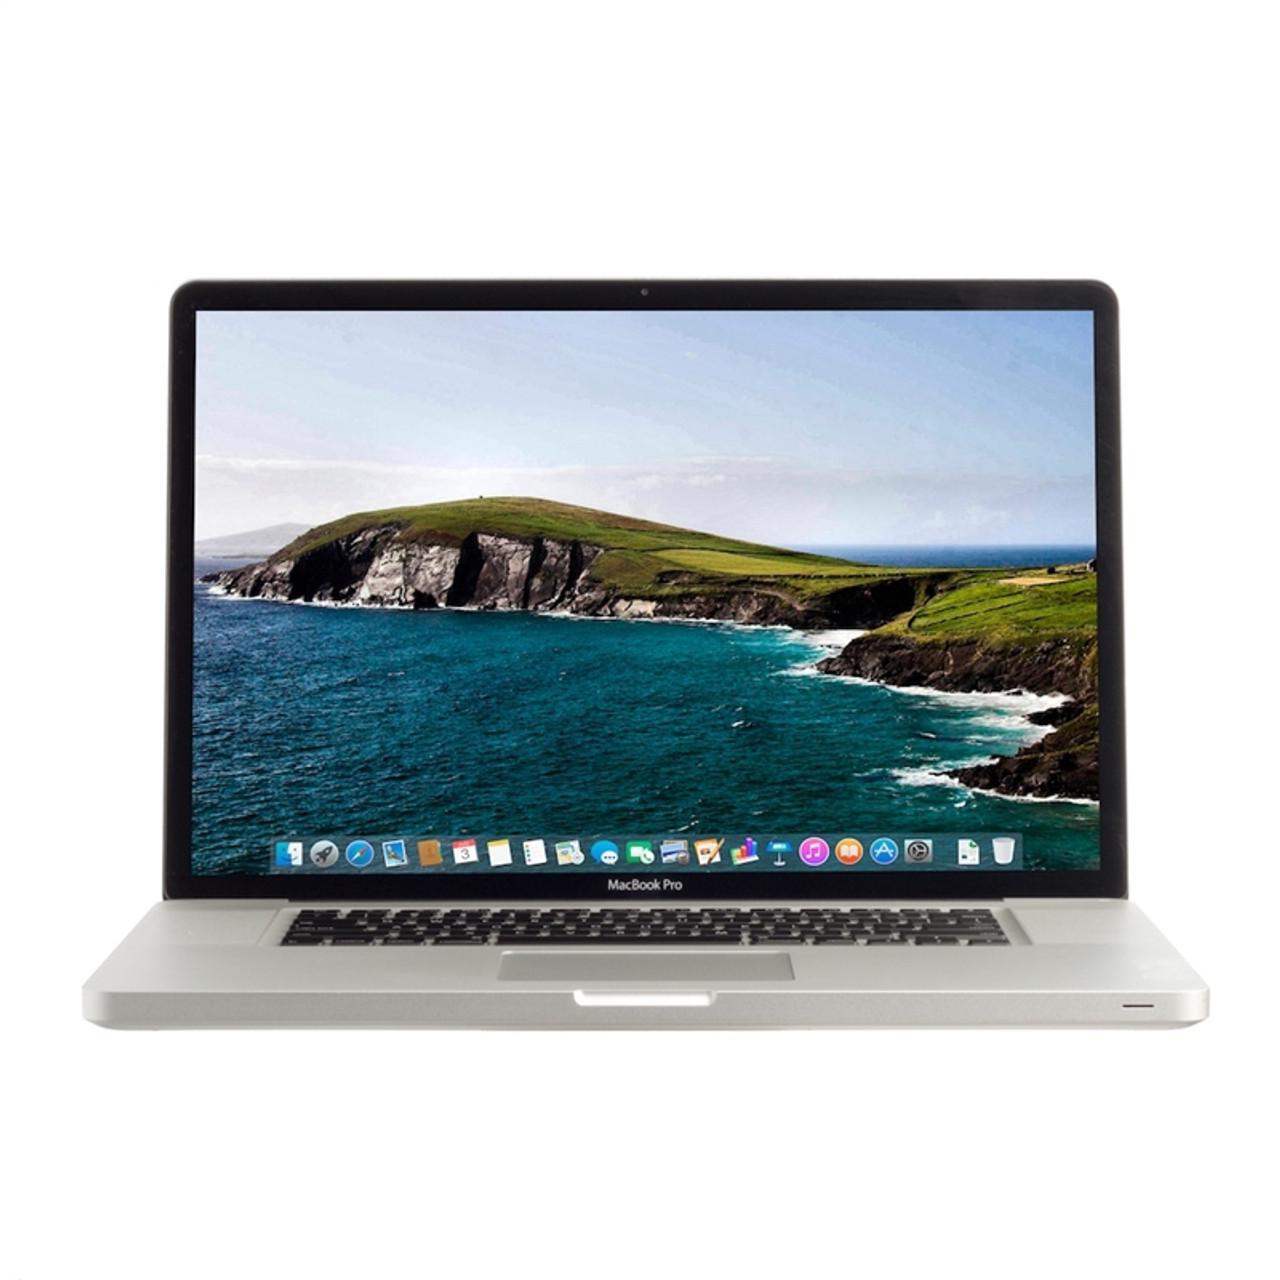 macbook pro 17 2 53ghz mid 2010 mac of all trades rh macofalltrades com 17 Inch MacBook Pro 2016 17 Inch MacBook Pro 2017